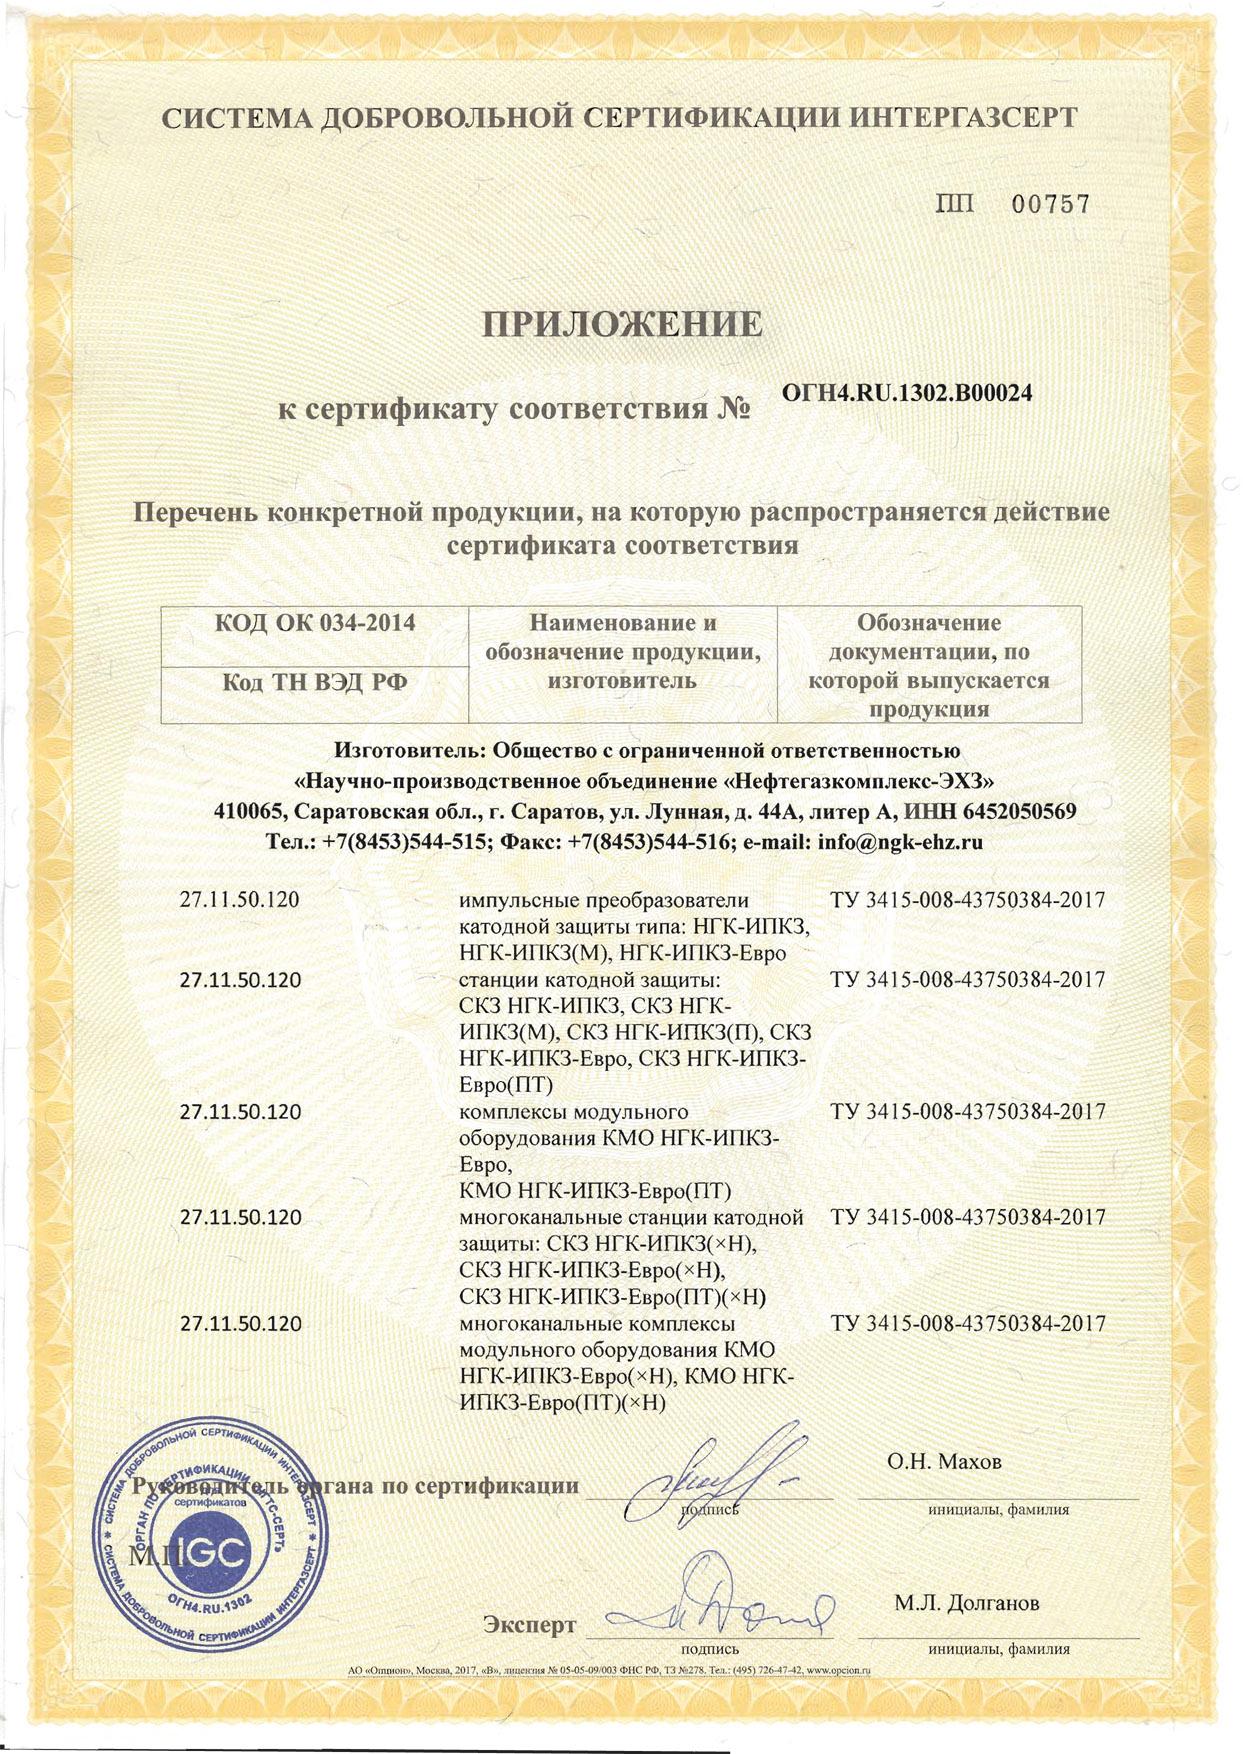 24 Нефтегазкомплекс-ЭХЗ (ИПКЗ)-2